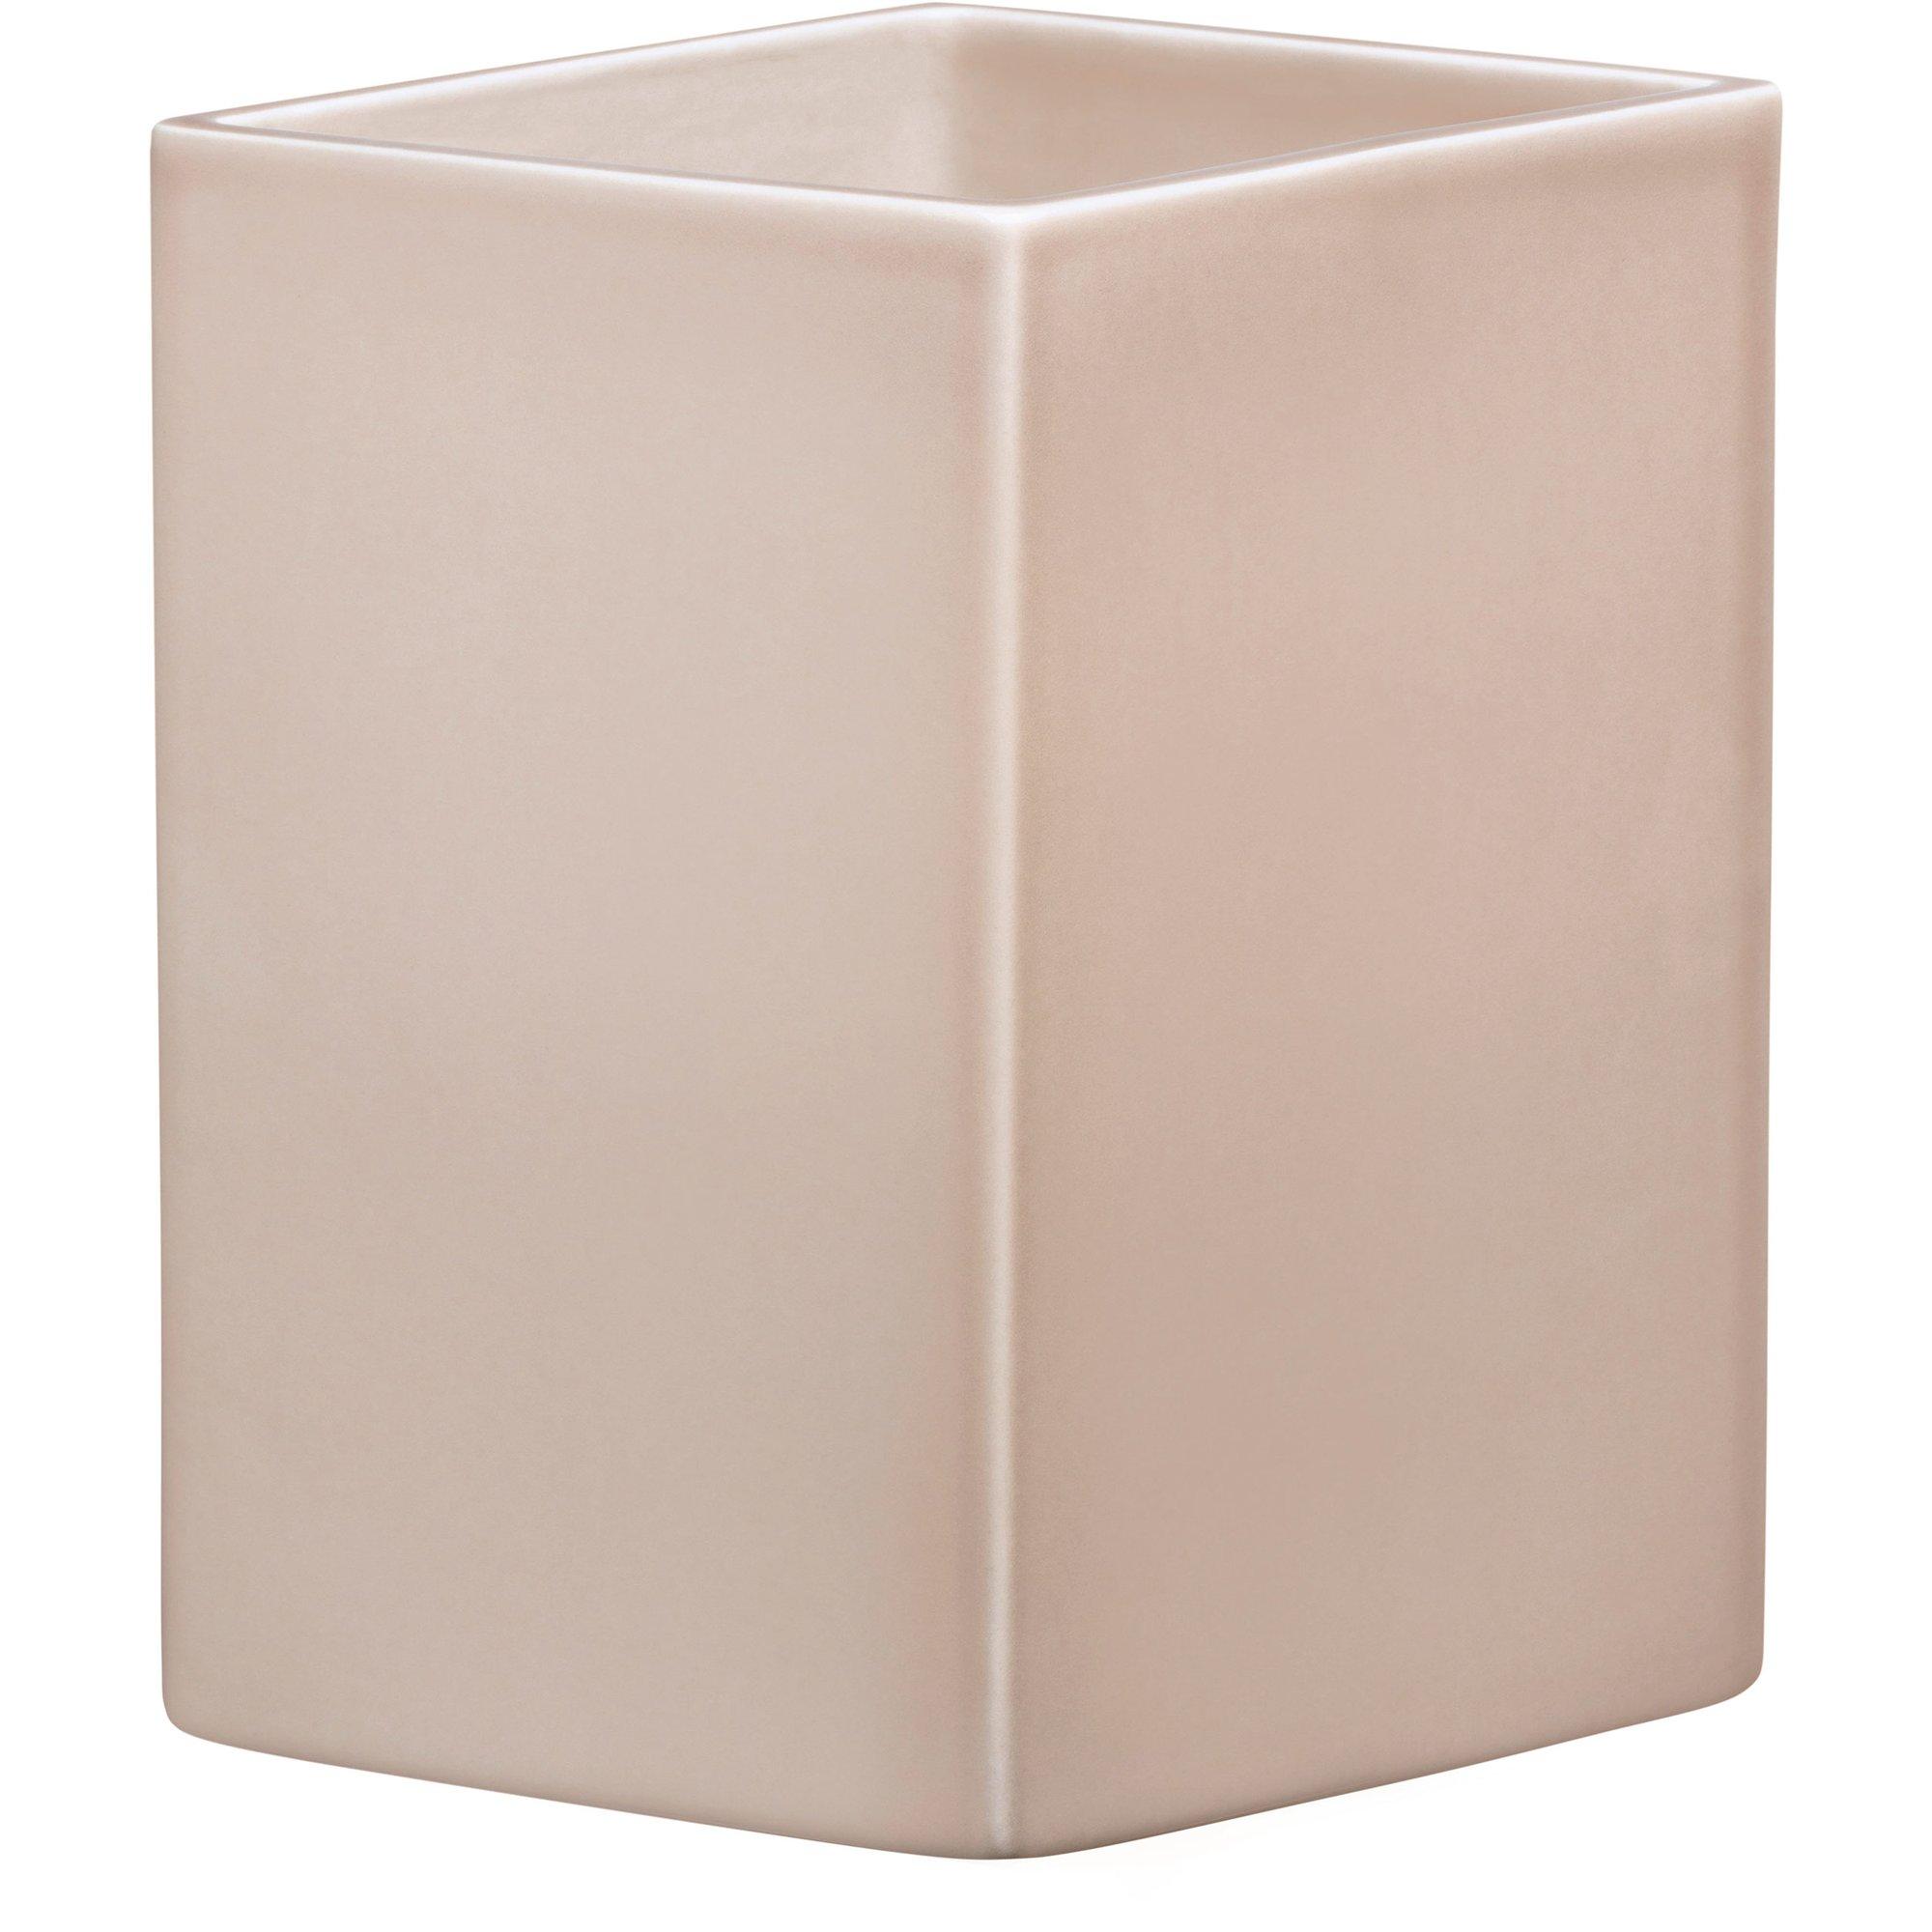 Iittala Ruutu keramik vas 225 cm. Beige